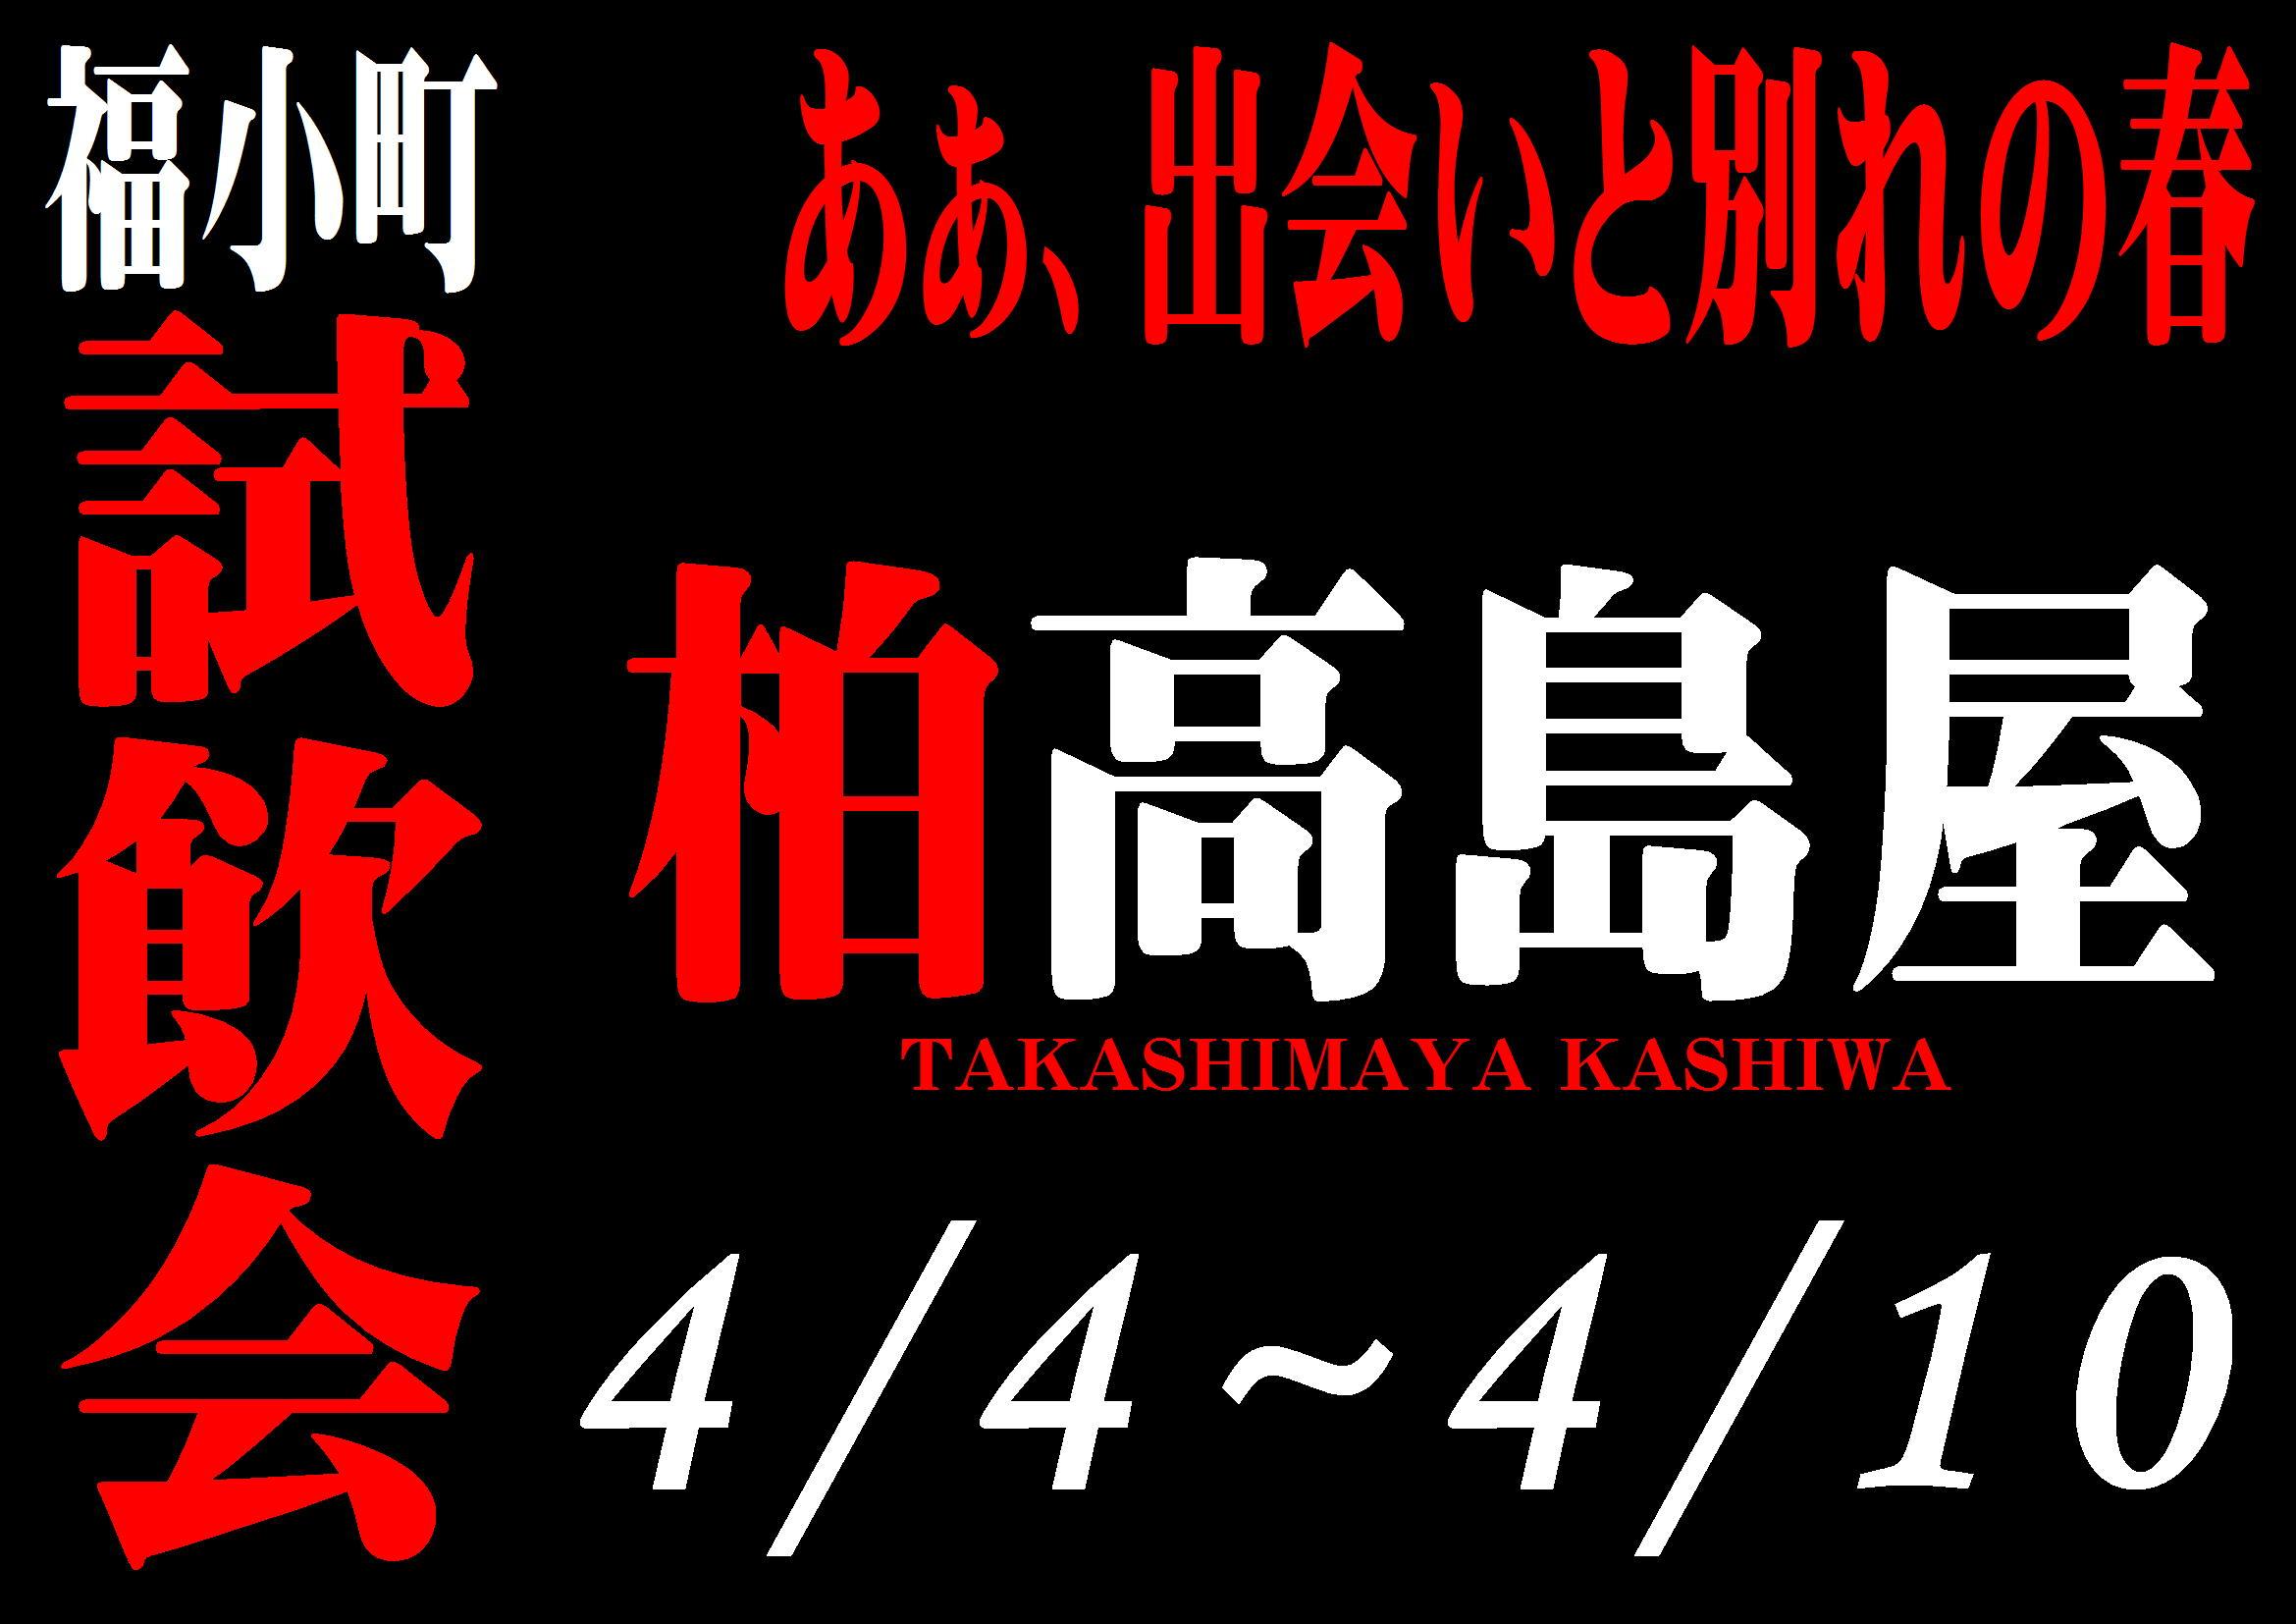 http://www.fukukomachi.com/blog/photo/20180404.JPG